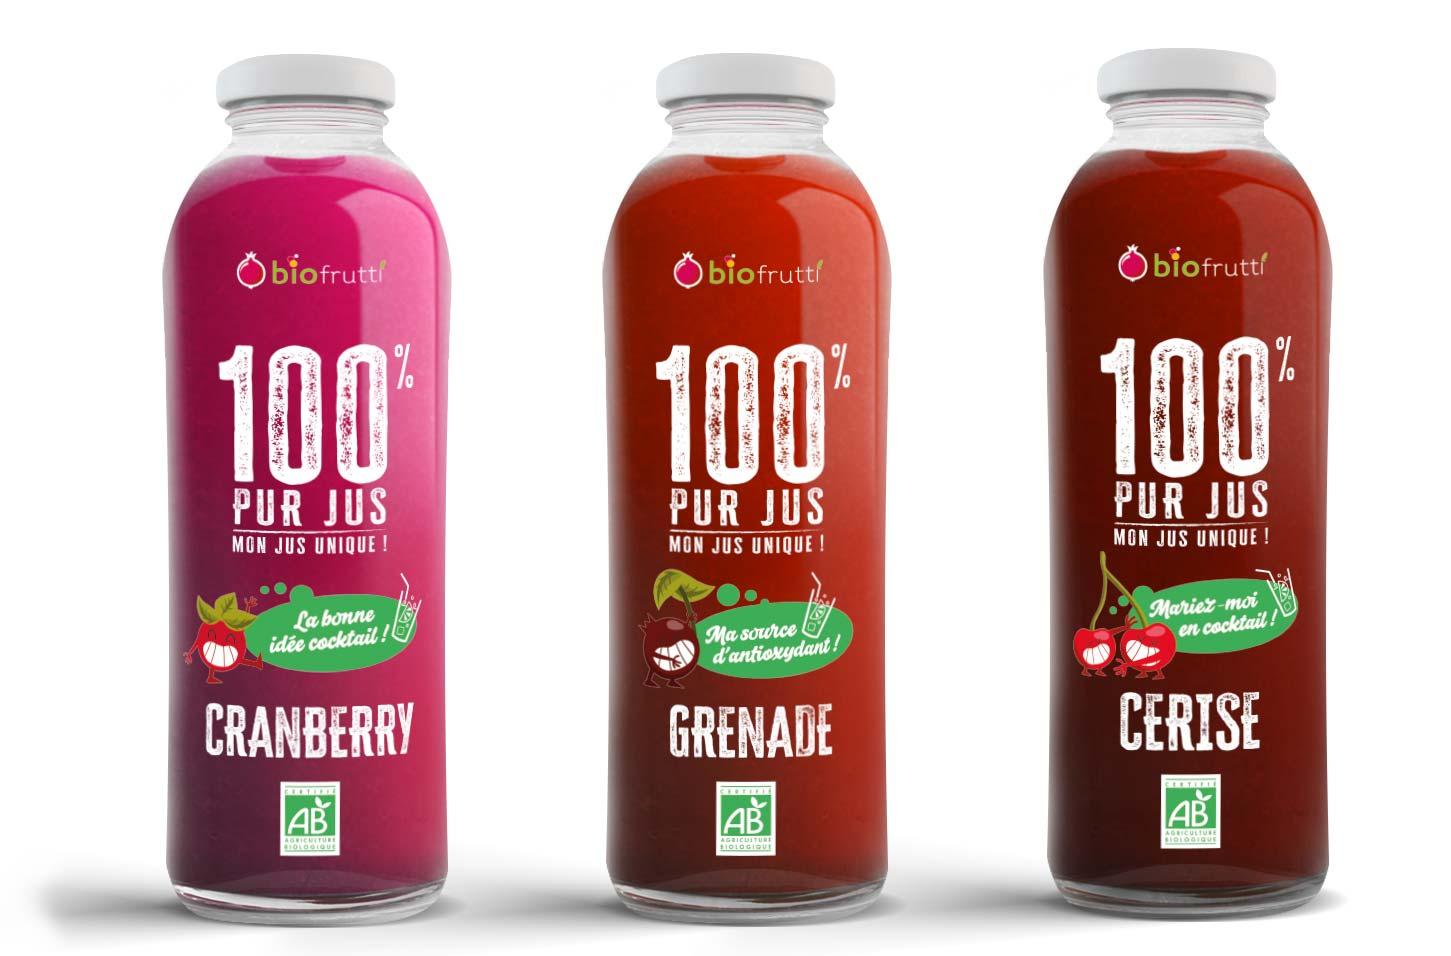 Cranberry grenade cerise 100% pur jus Biofrutti